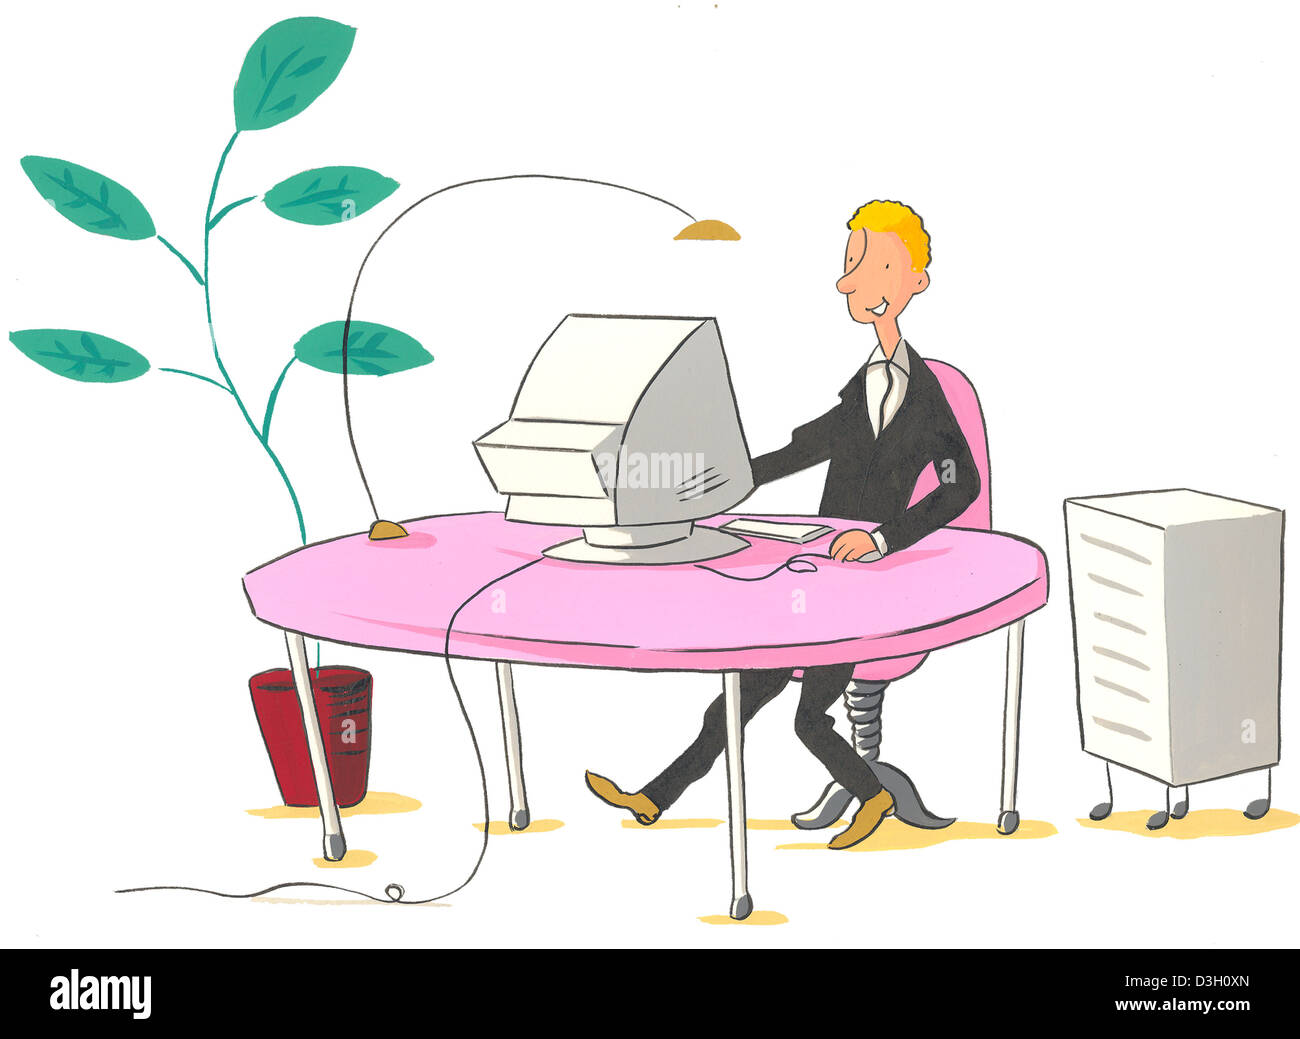 COMPUTER, ILLUSTRATION - Stock Image